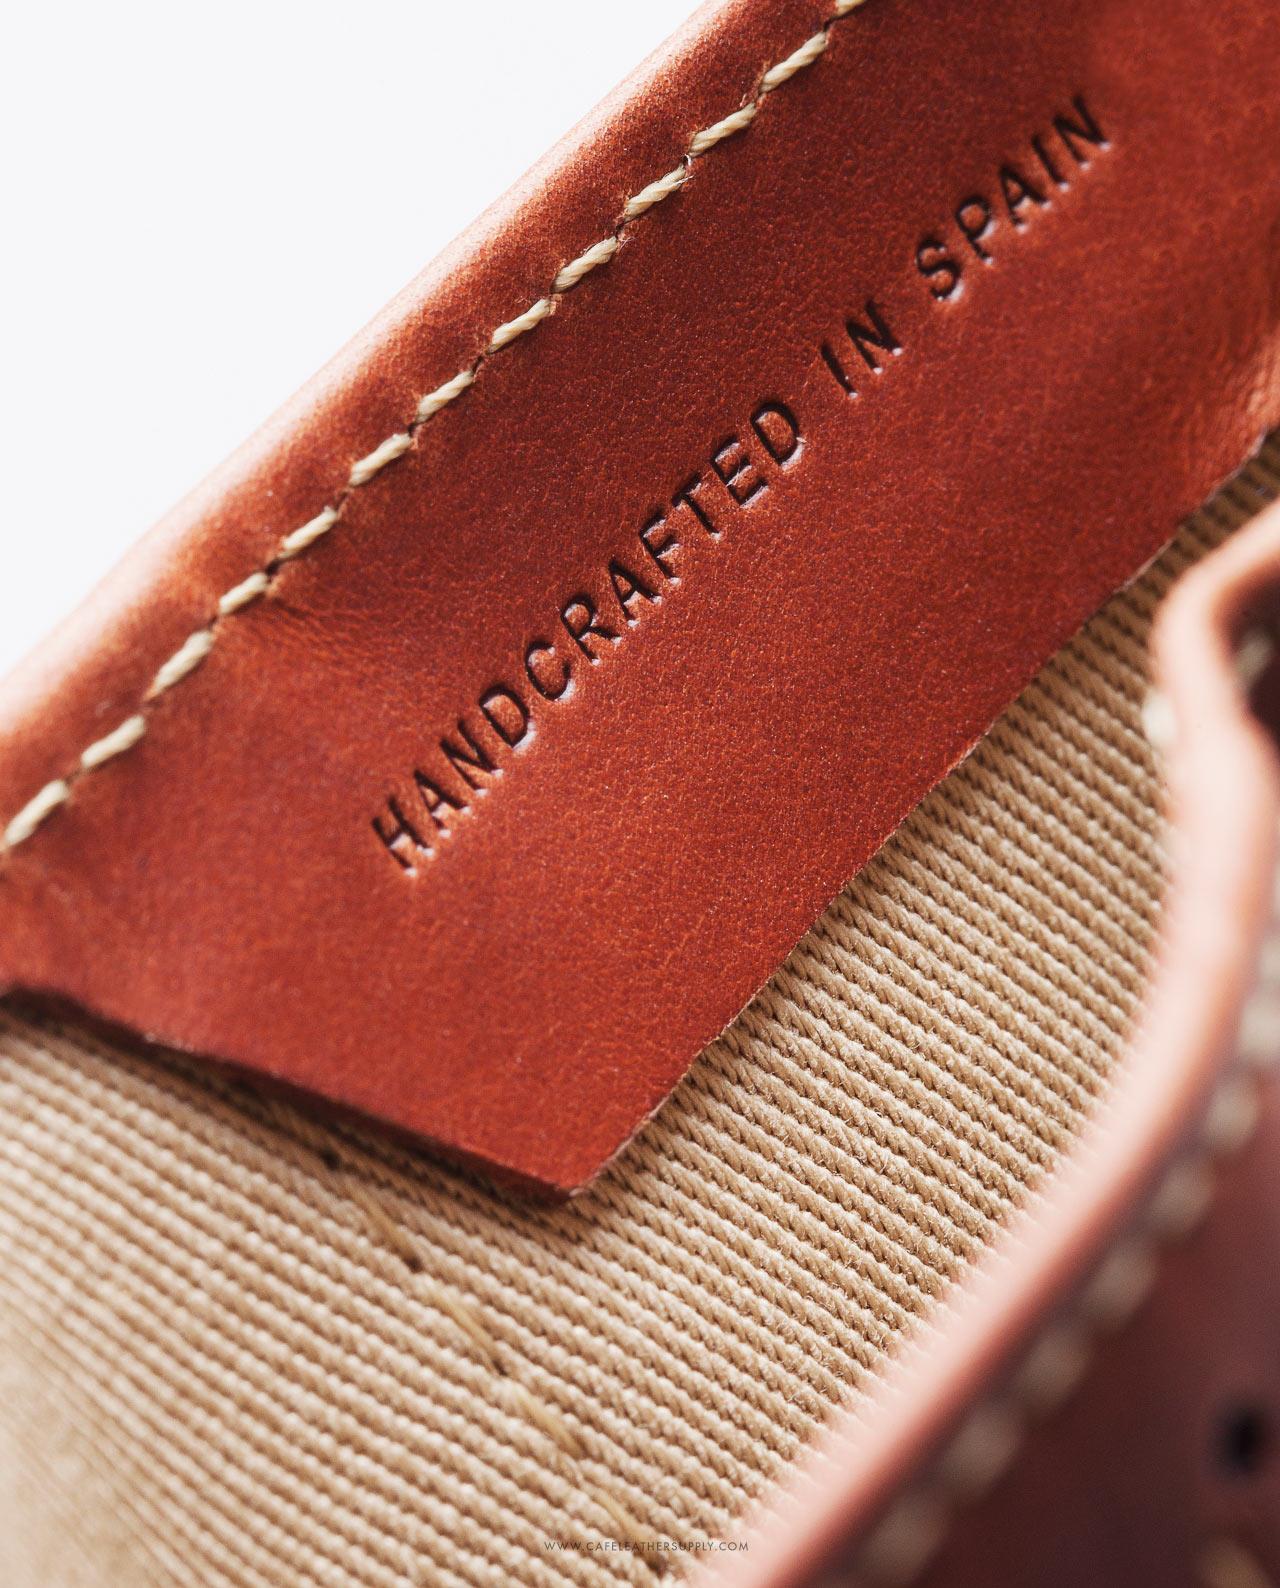 Bolsillo para monedas de la cartera de piel costa rica roasted. Leather pouch for coins.